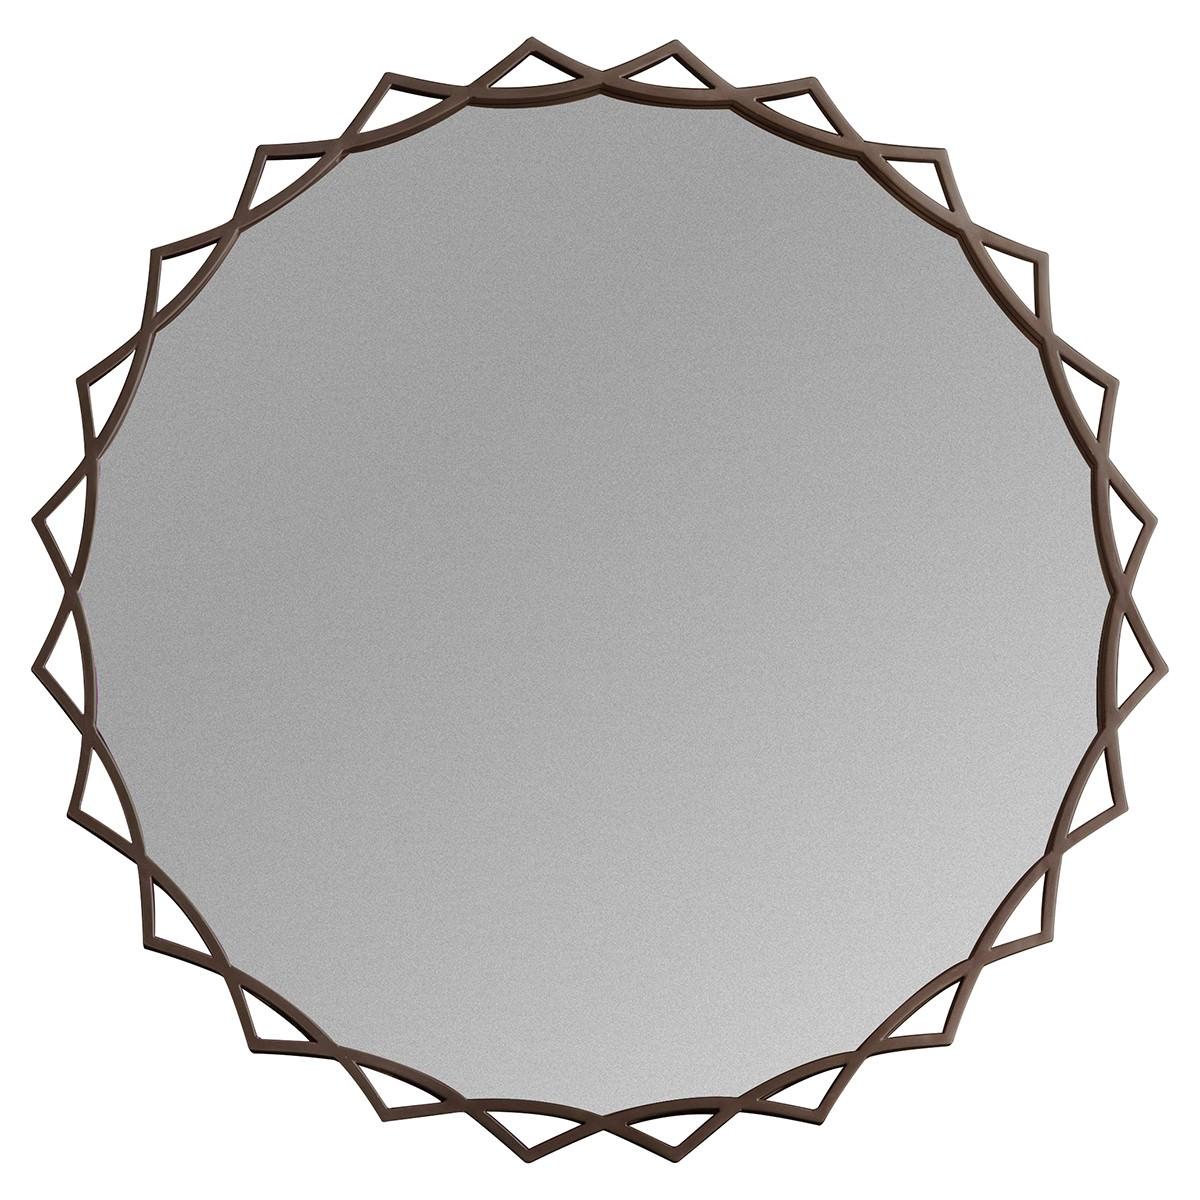 Nala Metal Frame Round Wall Mirror, 92cm, Bronze